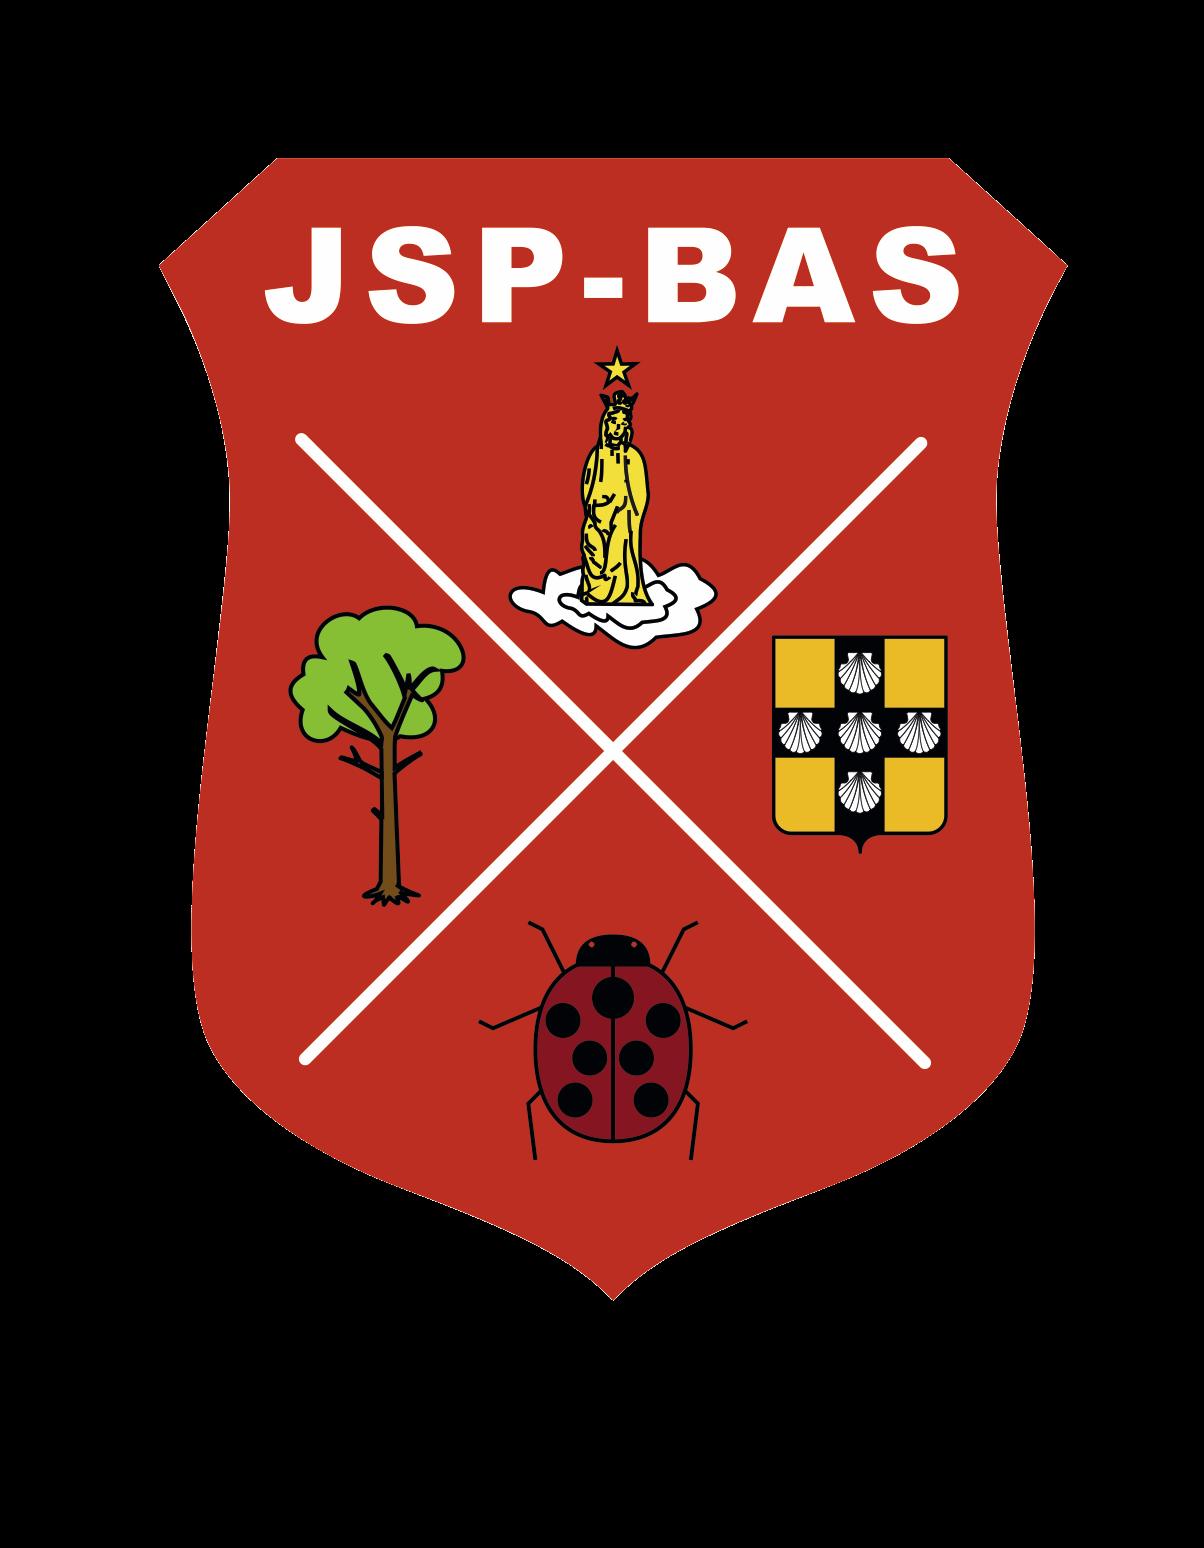 JSP BAS